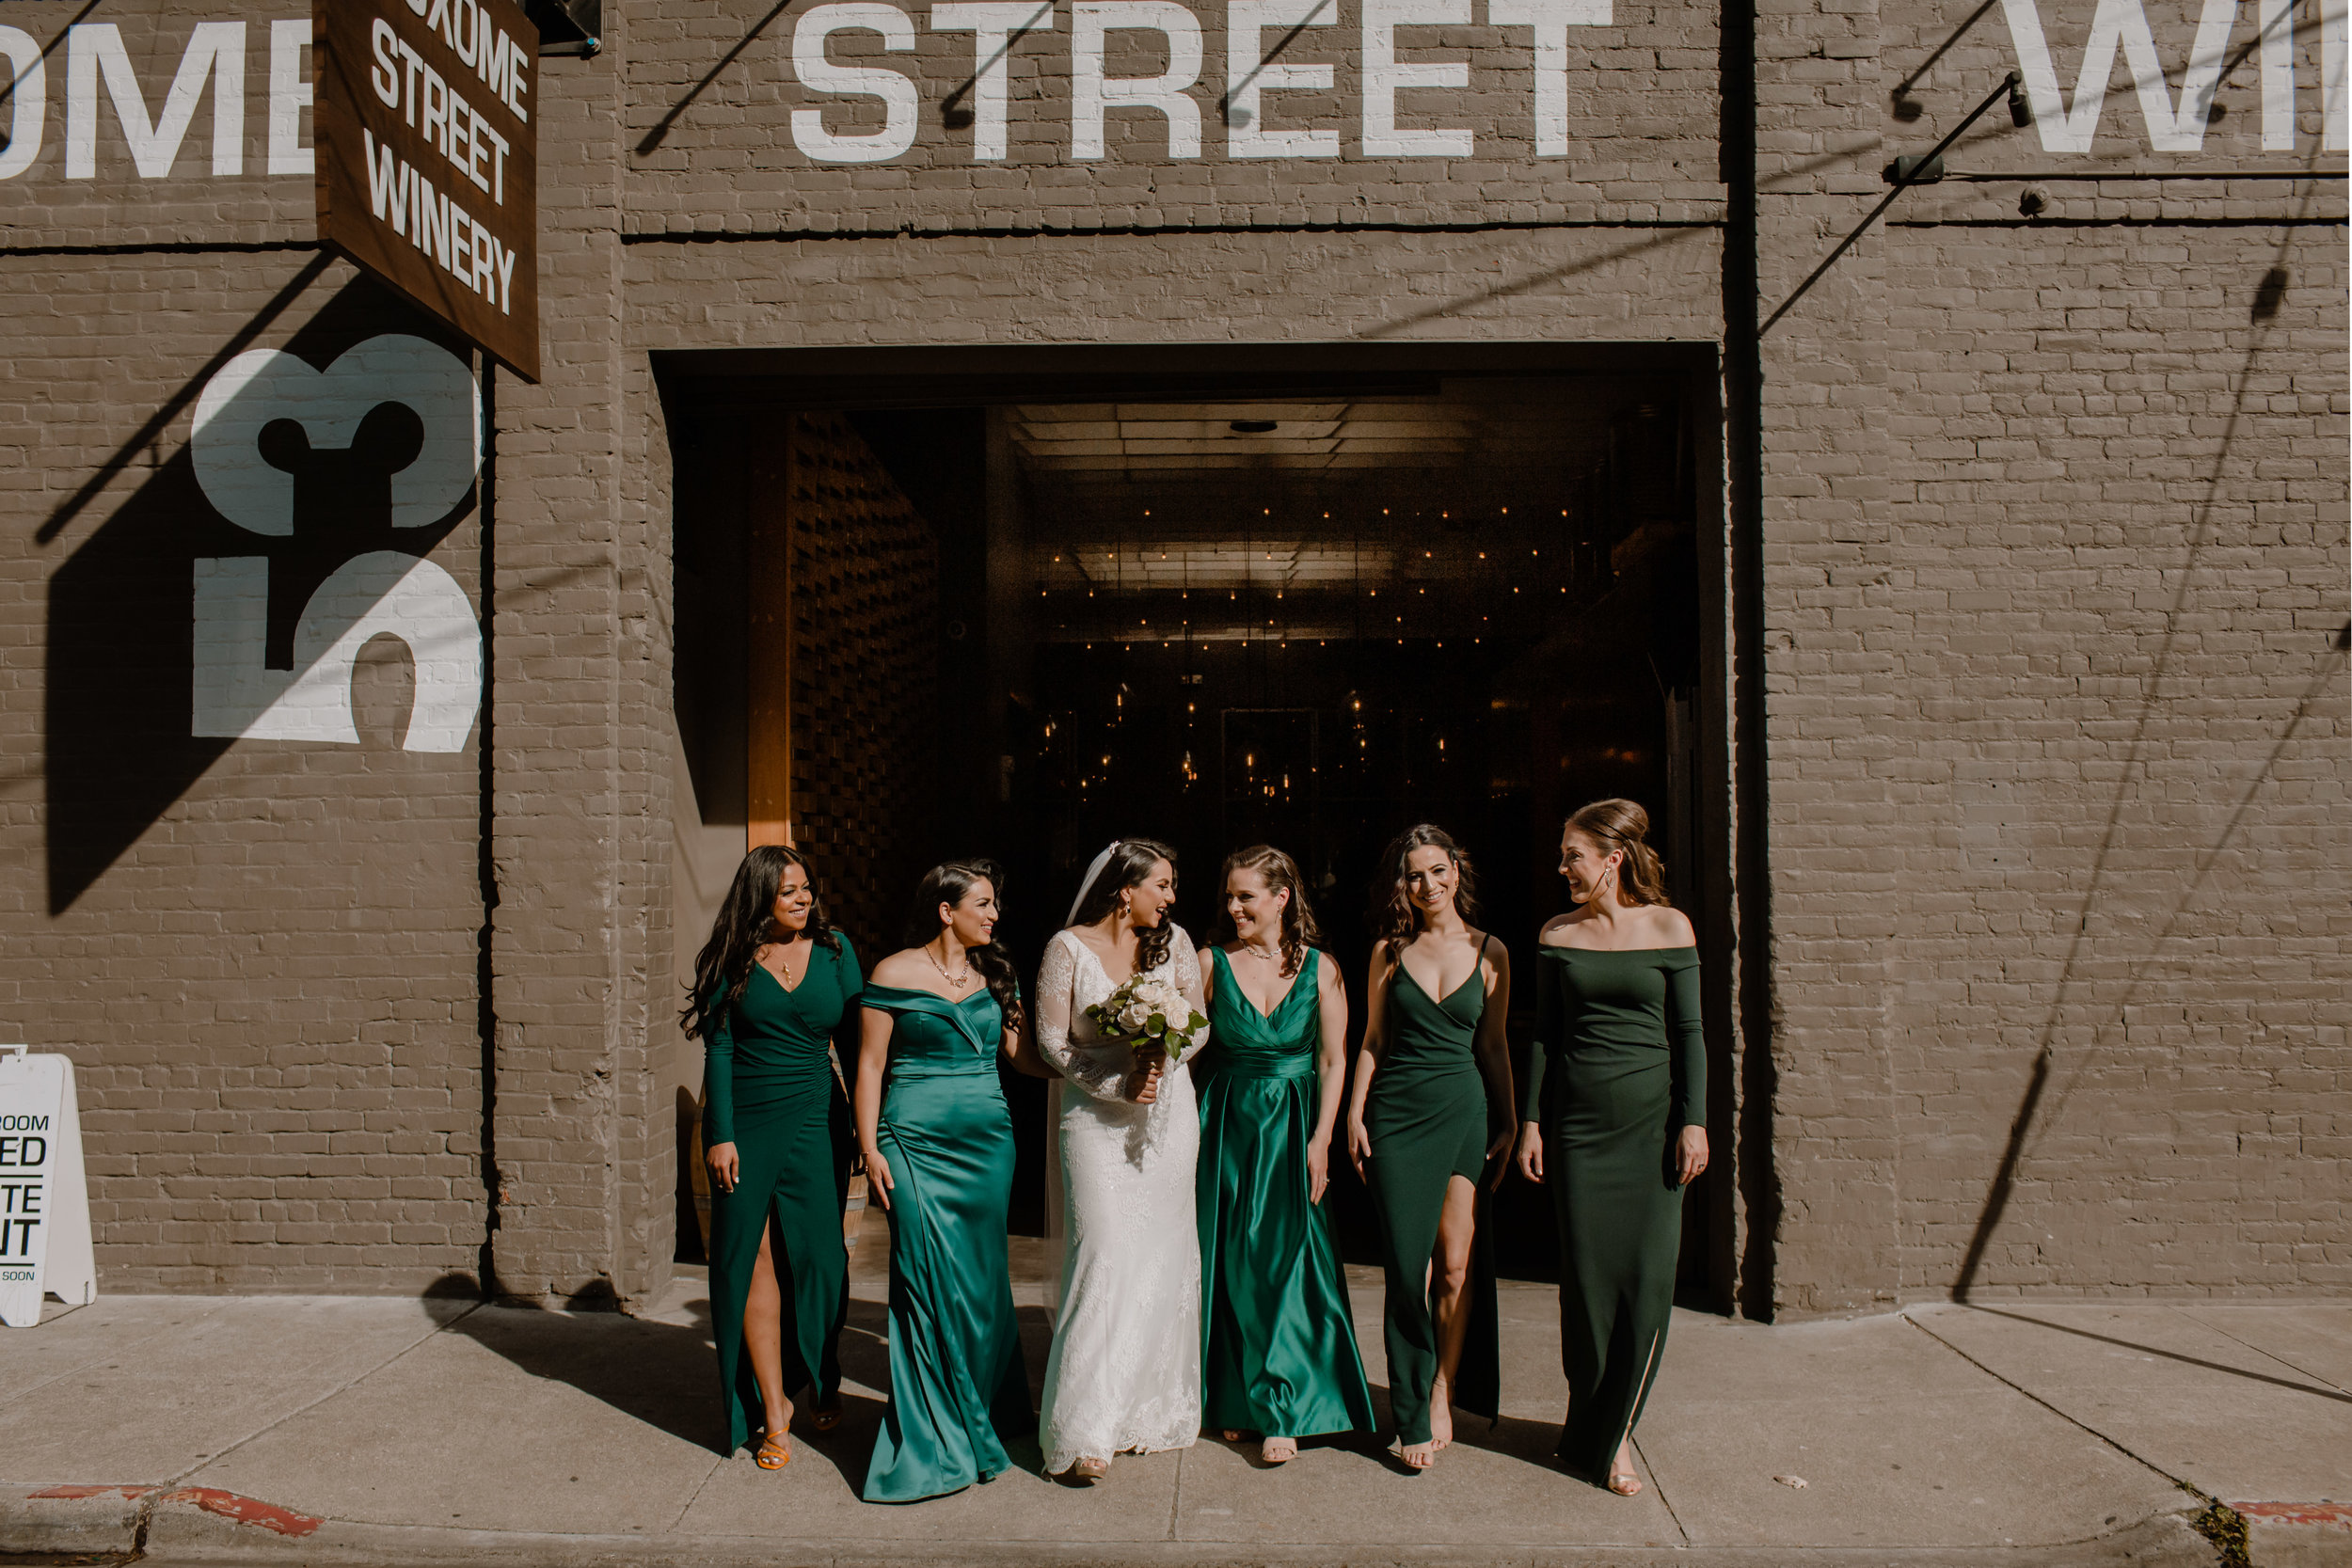 Azeta and Michael San Francisco Intimate Wedding - Eve Rox Photography-206.jpg